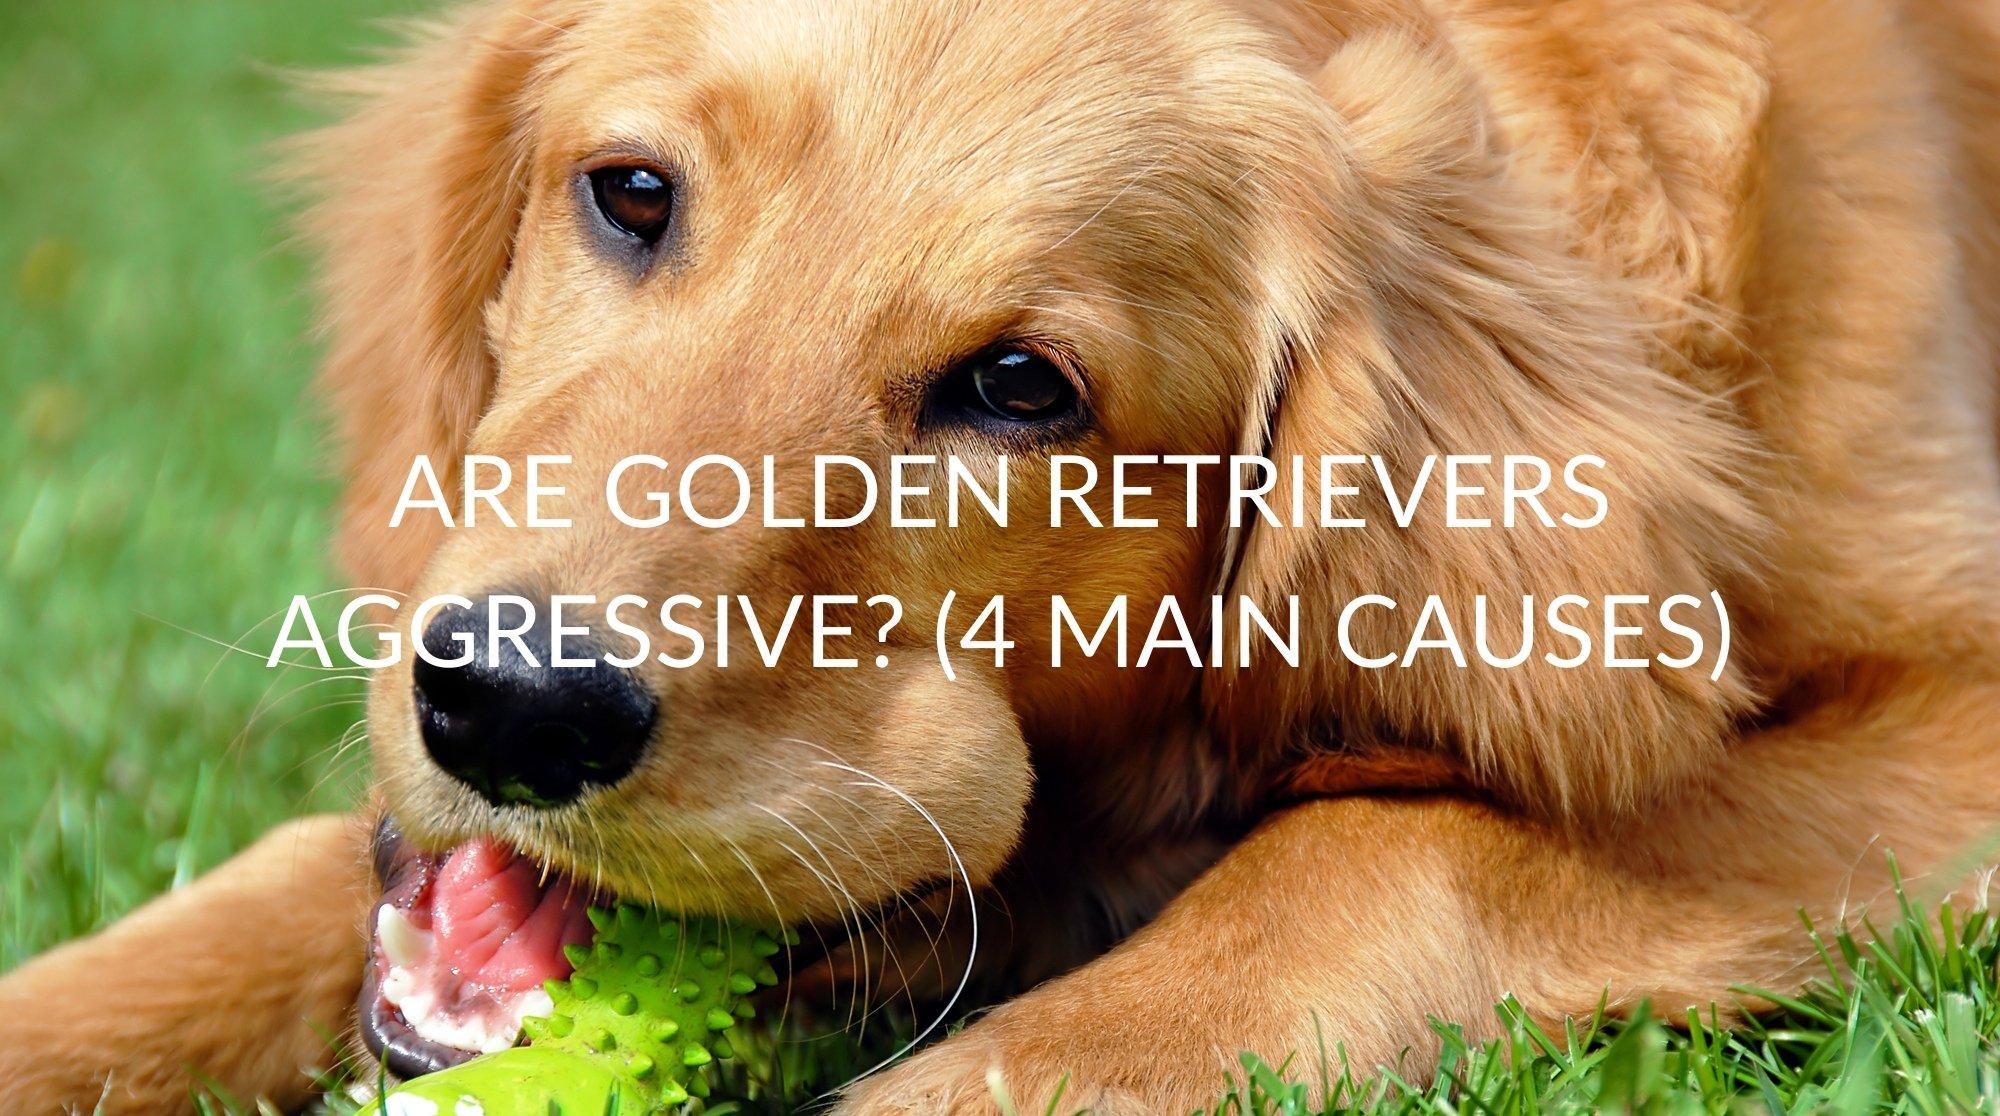 Are Golden Retrievers Aggressive? (4 Main Causes)